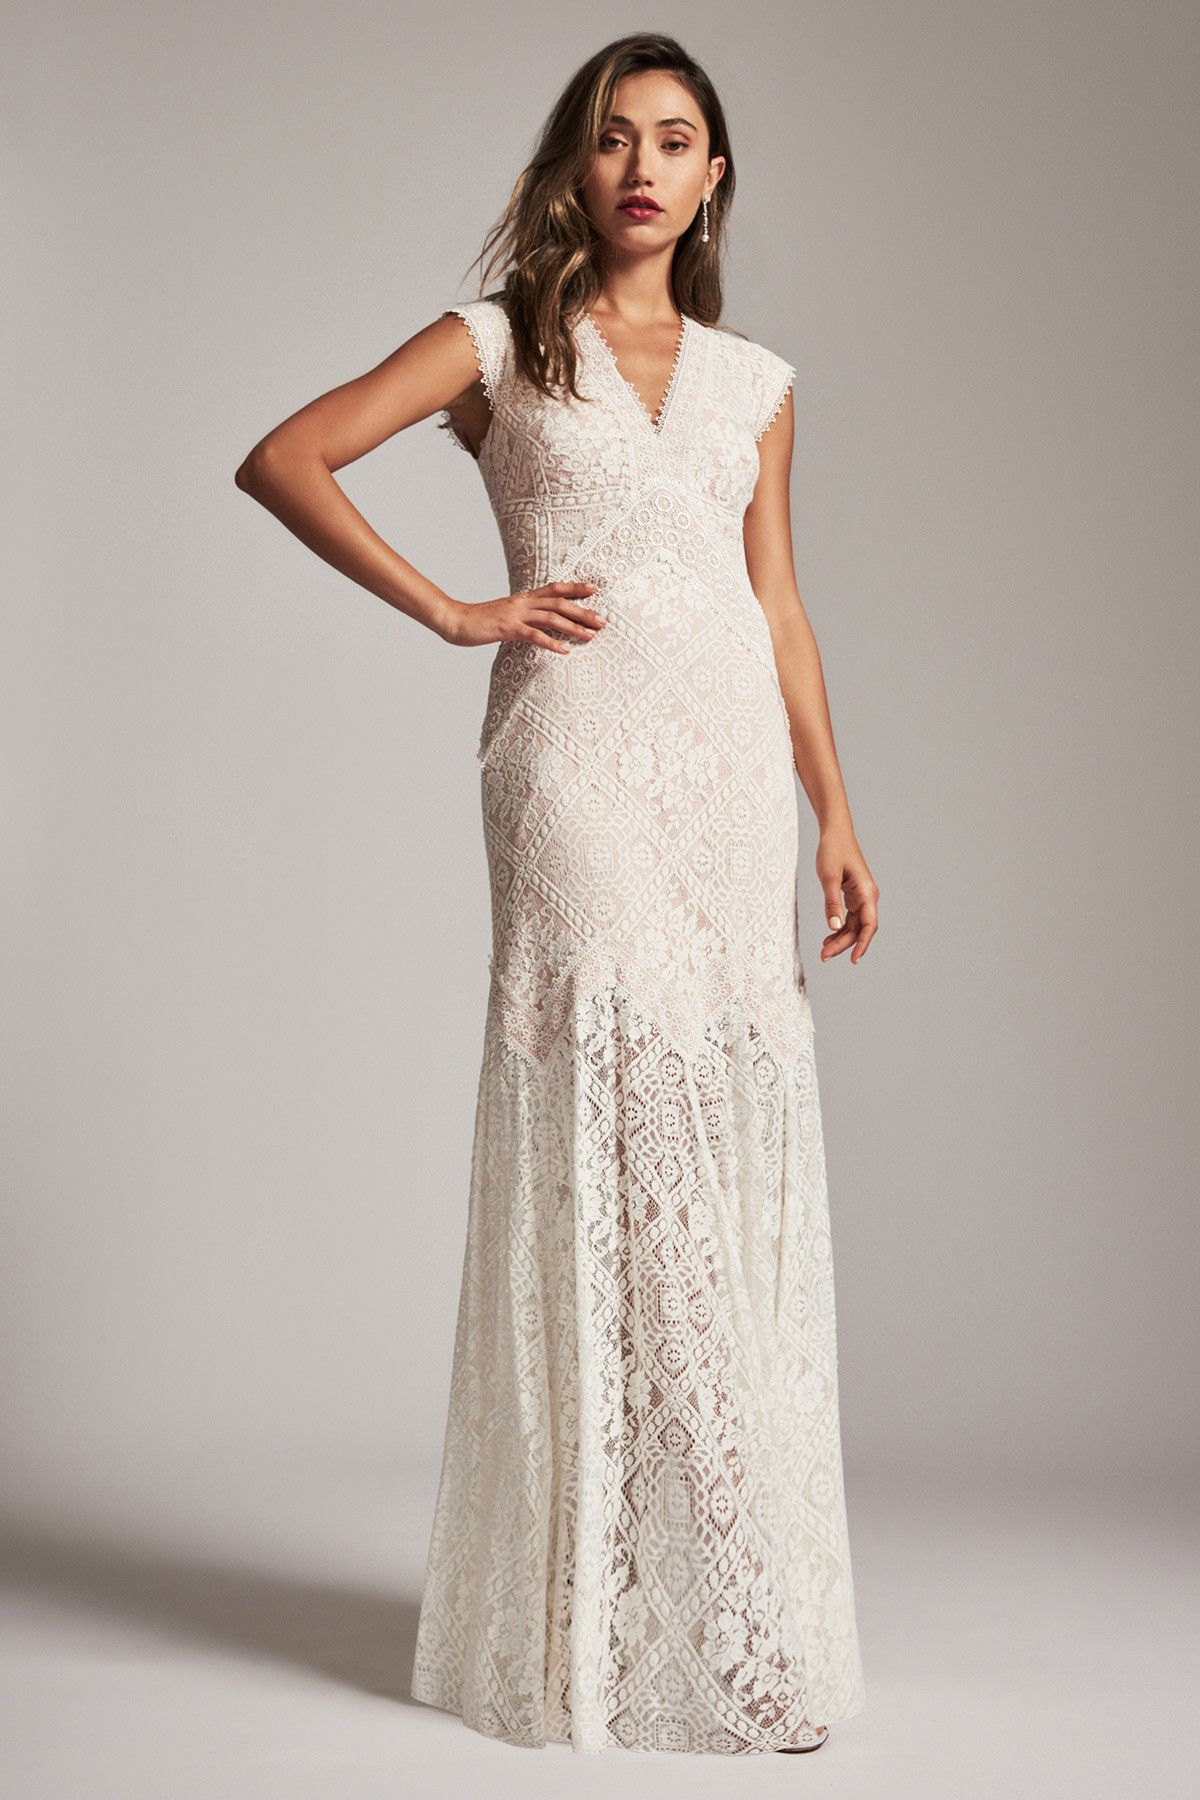 Tadashi shoji bridal arabella gown boho wedding pinterest